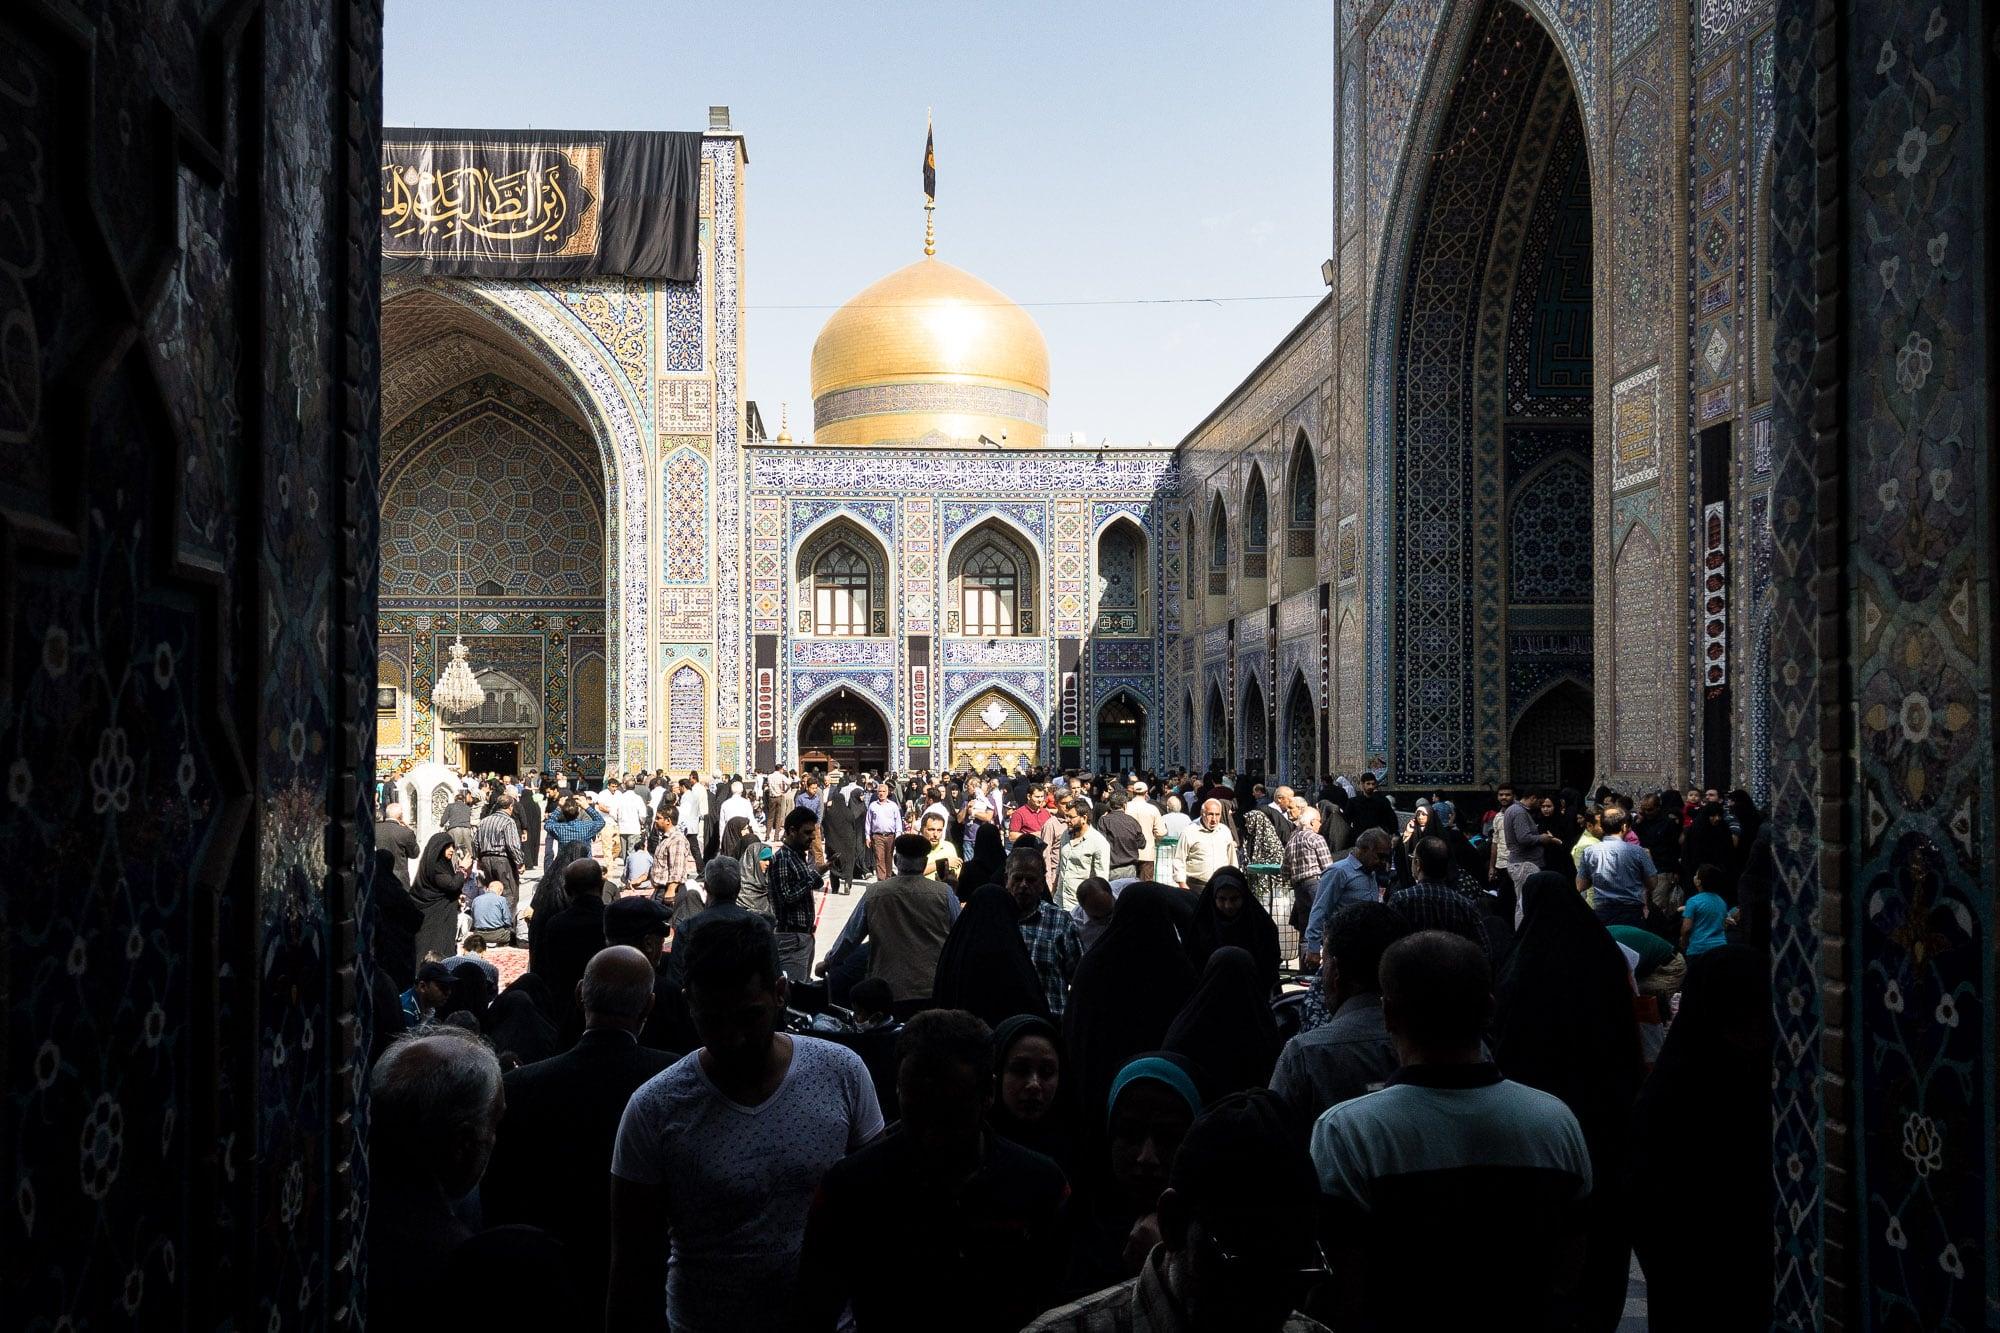 inside the shrine of Imam Reza